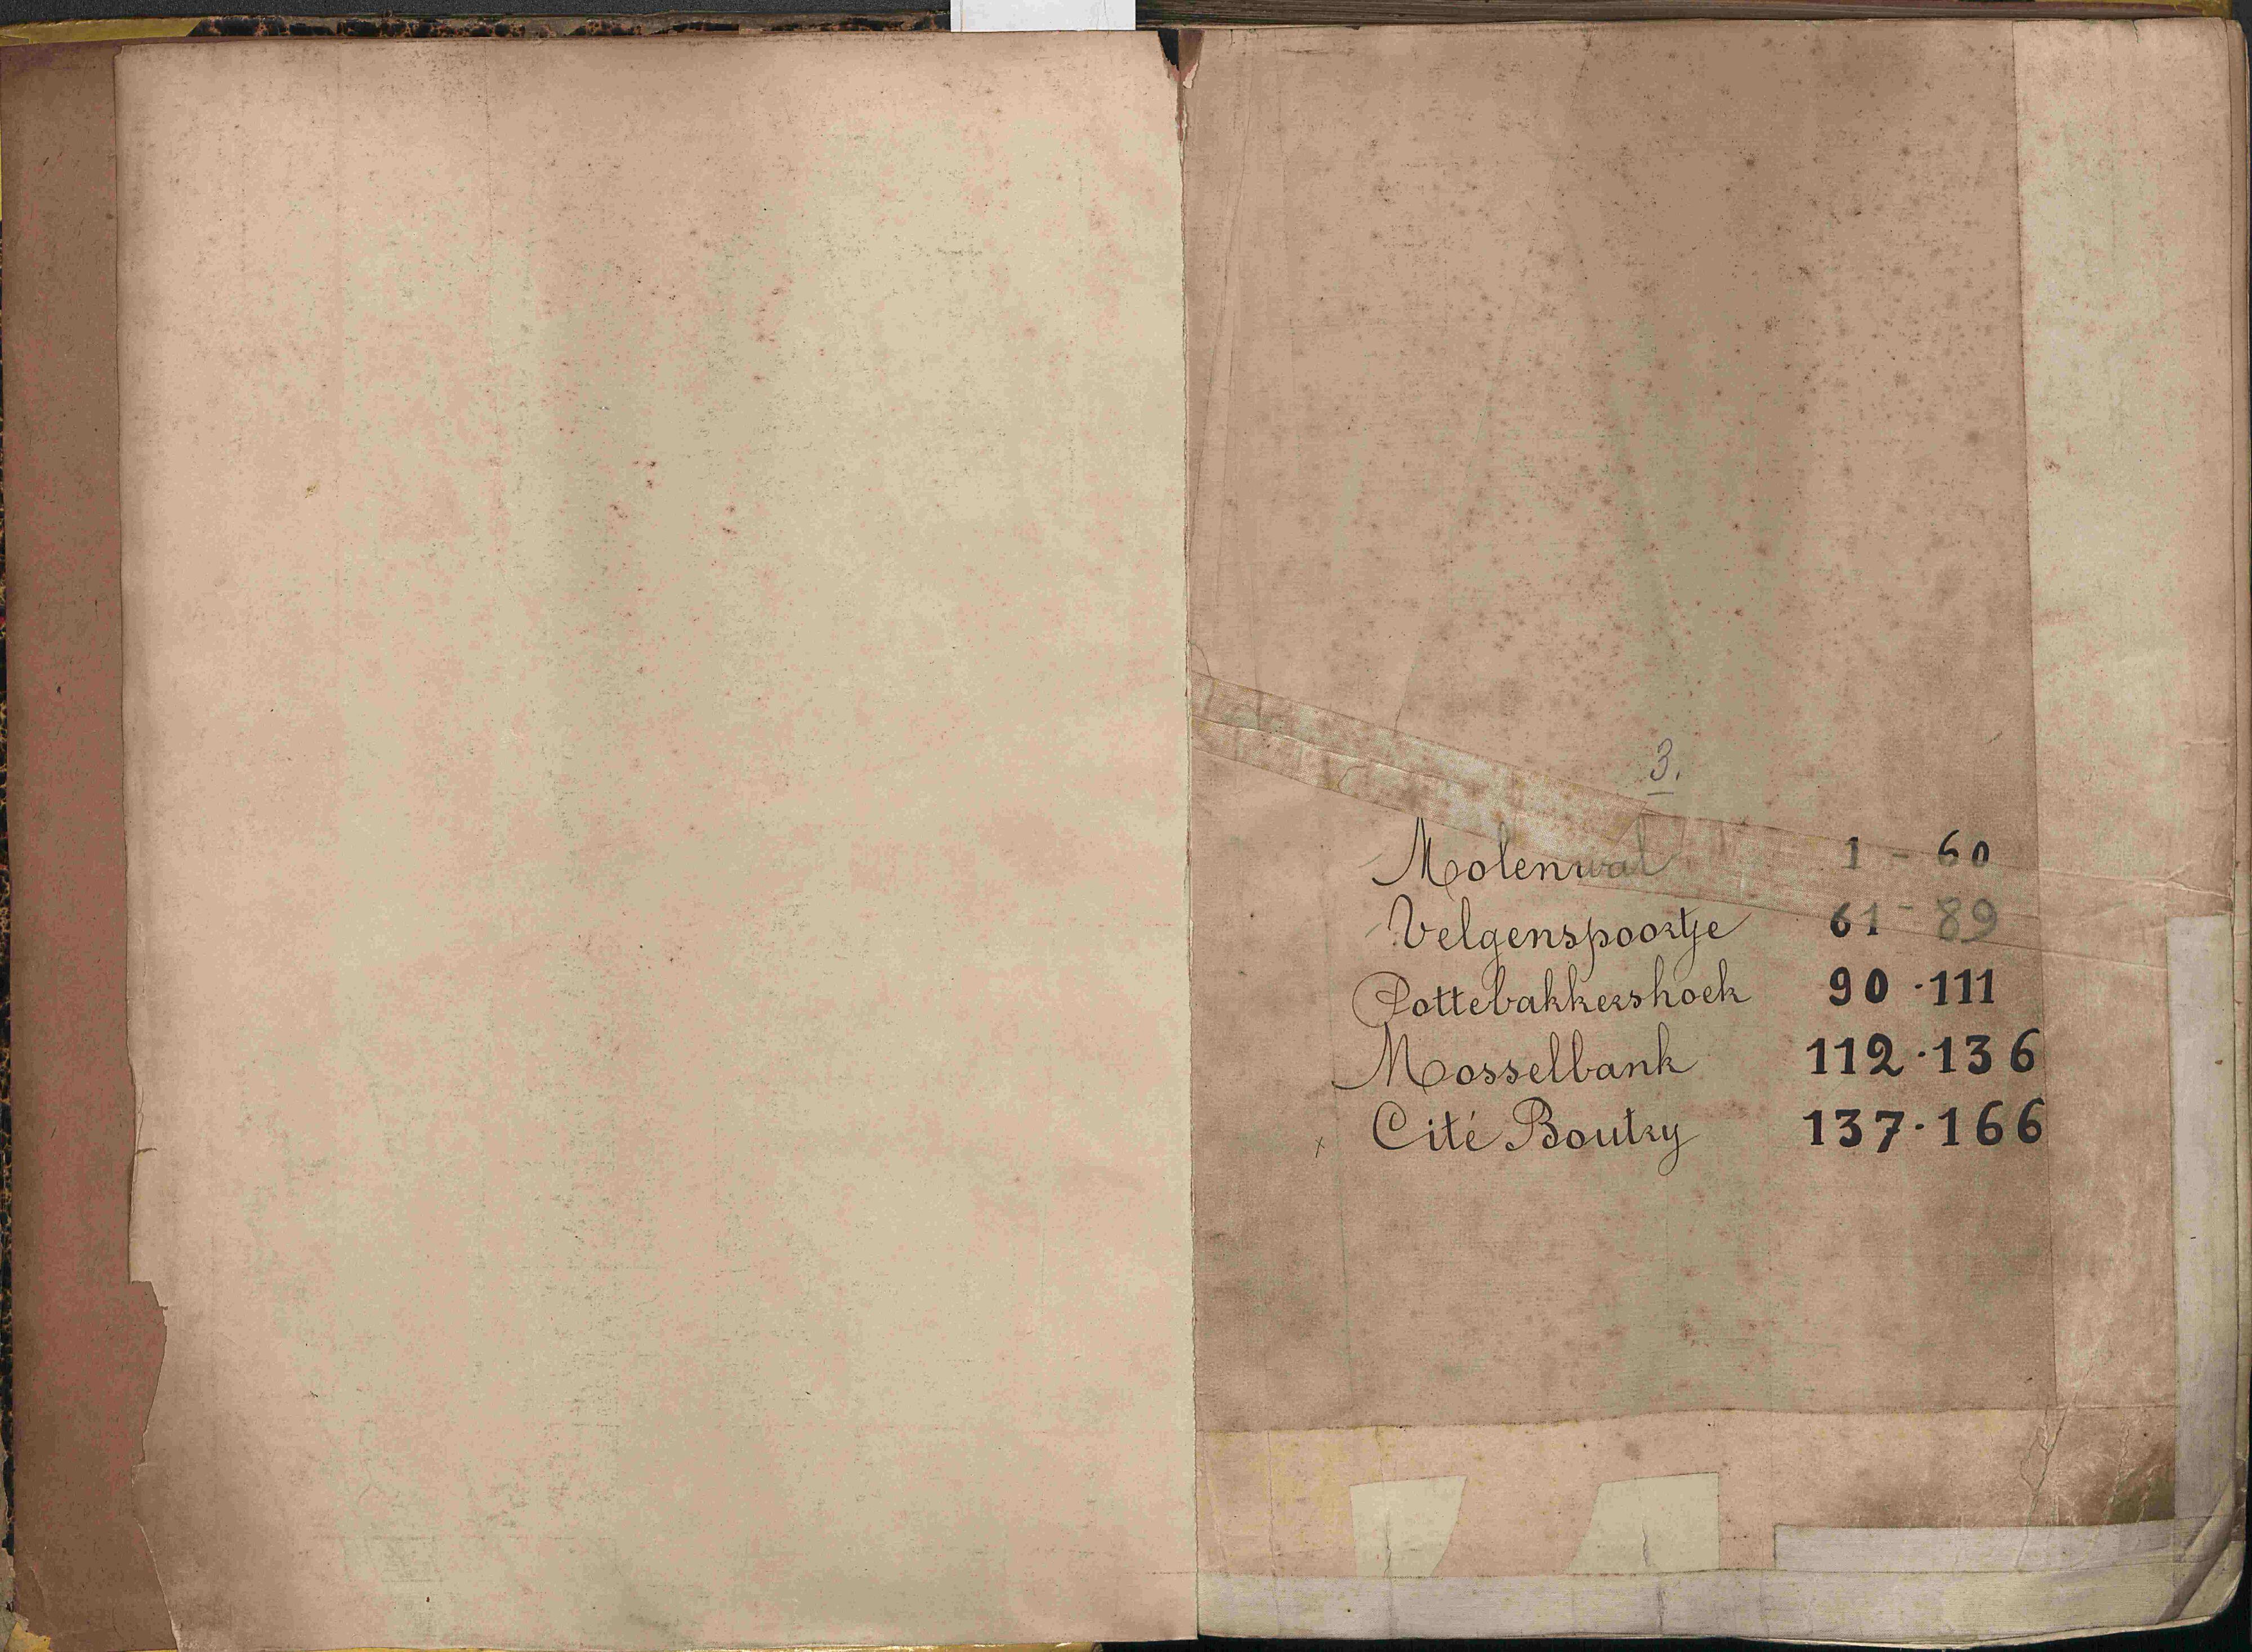 Bevolkingsregister Kortrijk 1890 boek 3